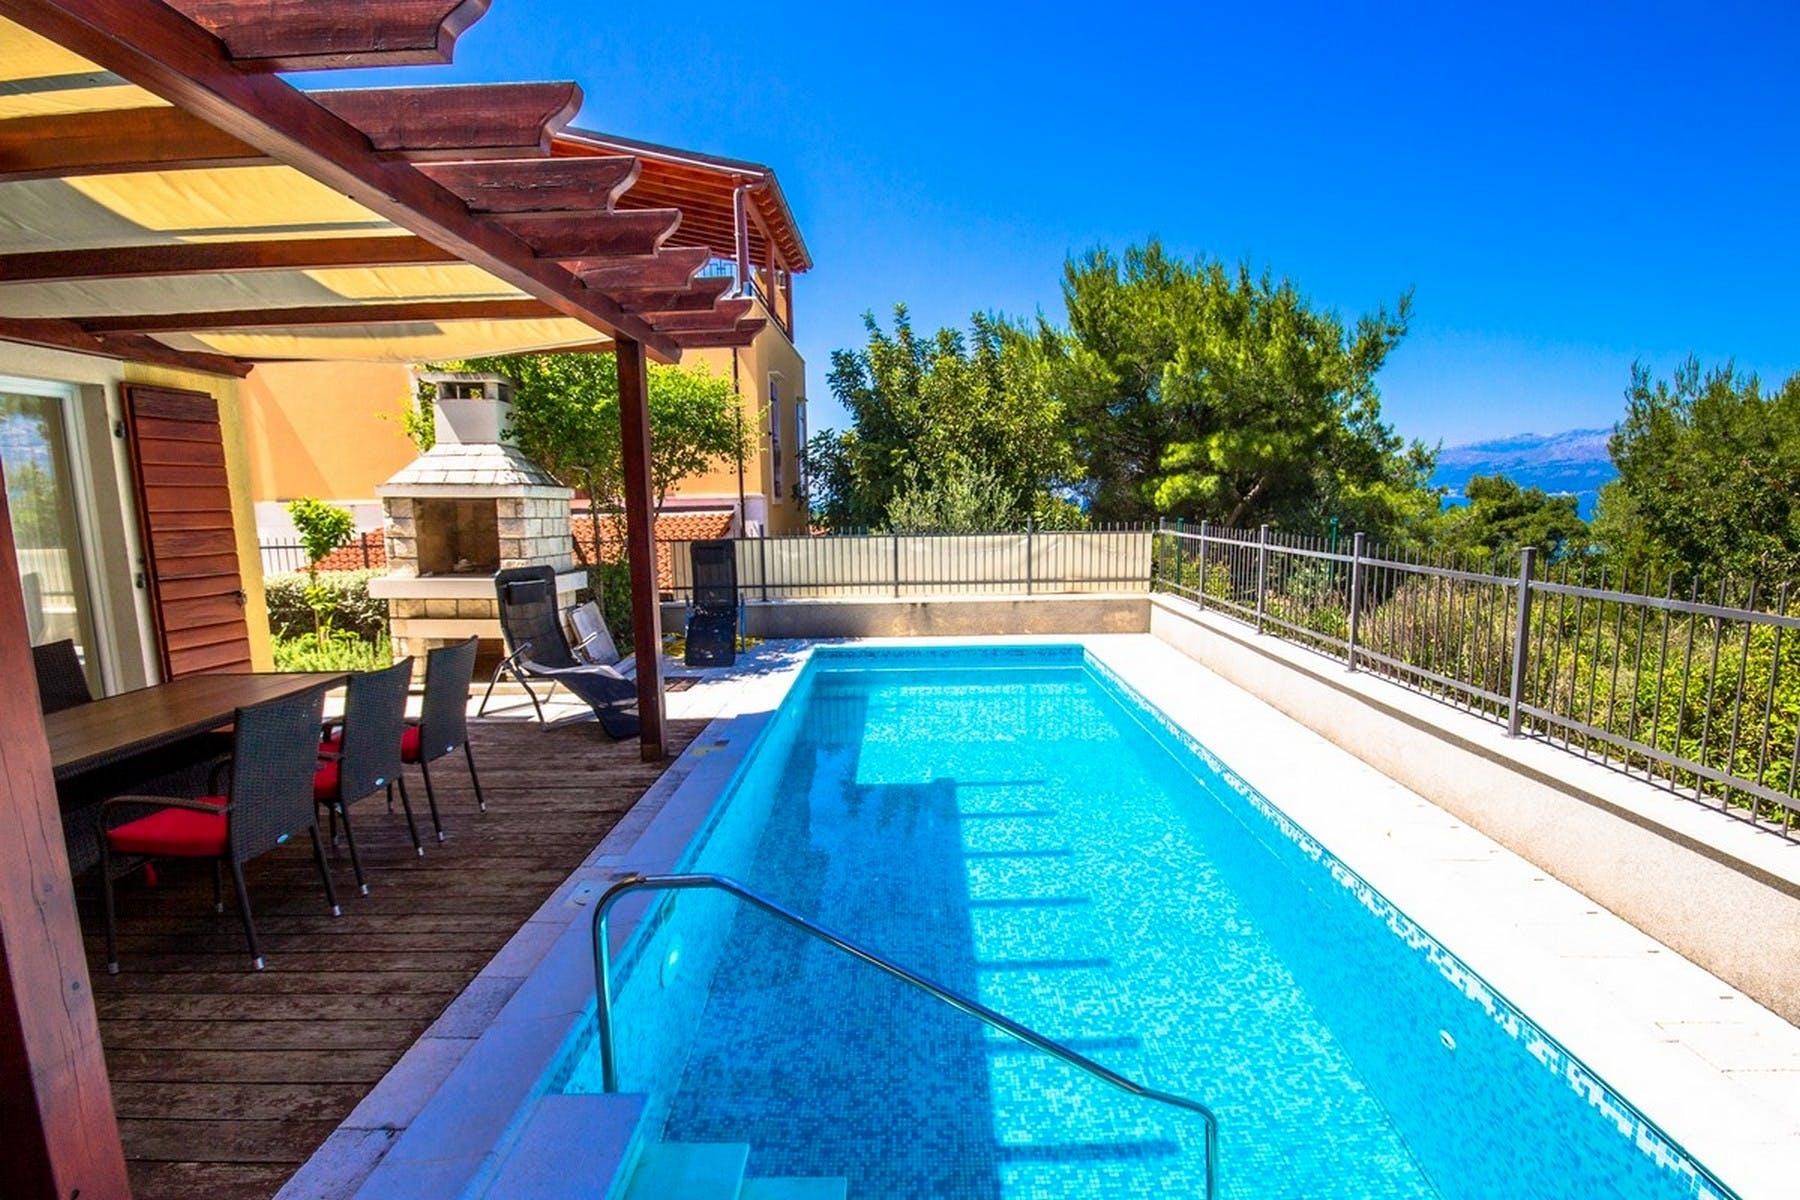 Pool area of the villa